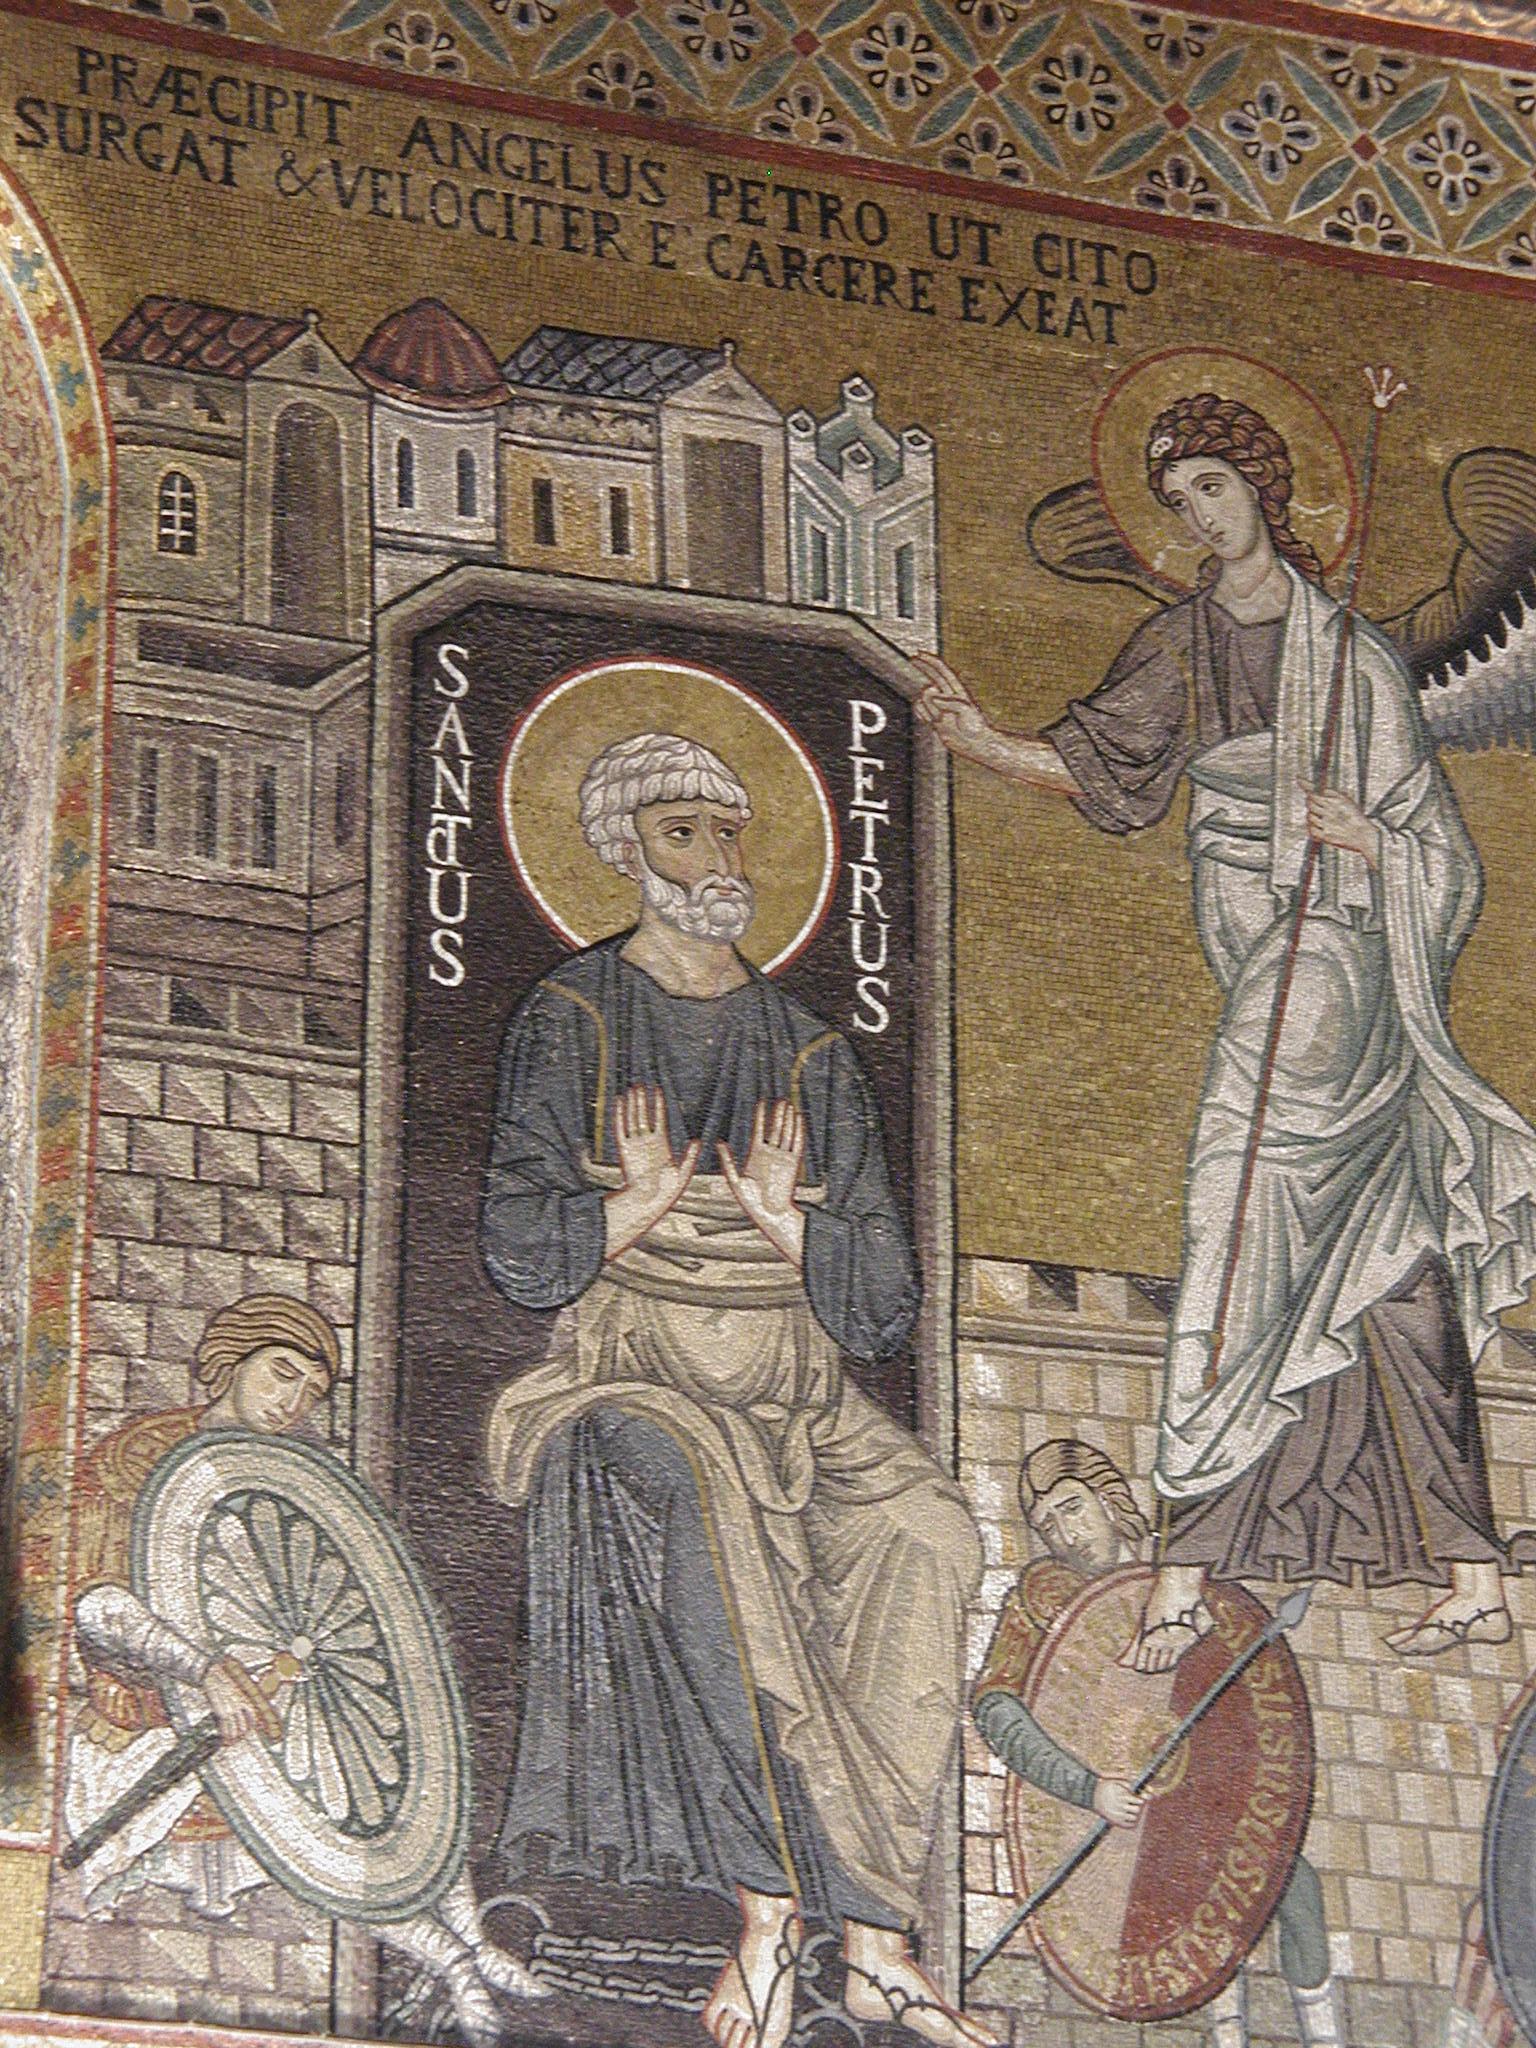 http://rubens.anu.edu.au/raid1cdroms/sicily/palermo/churches/cappella_palatina/south_aisle/south_wall_mosaics/P1012489.JPG